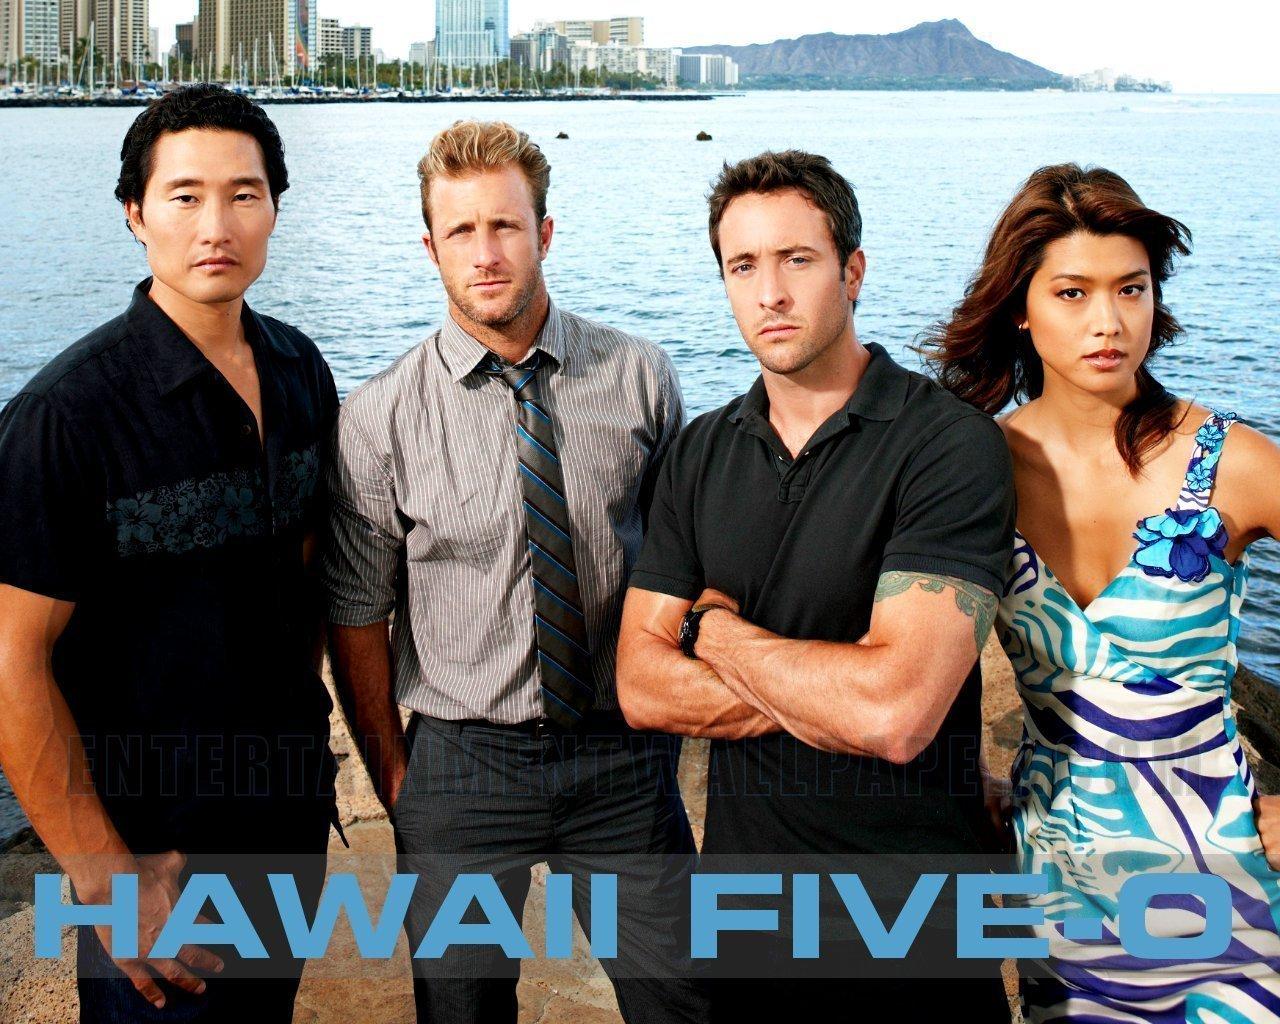 Hawaii Five-O (2010 series)